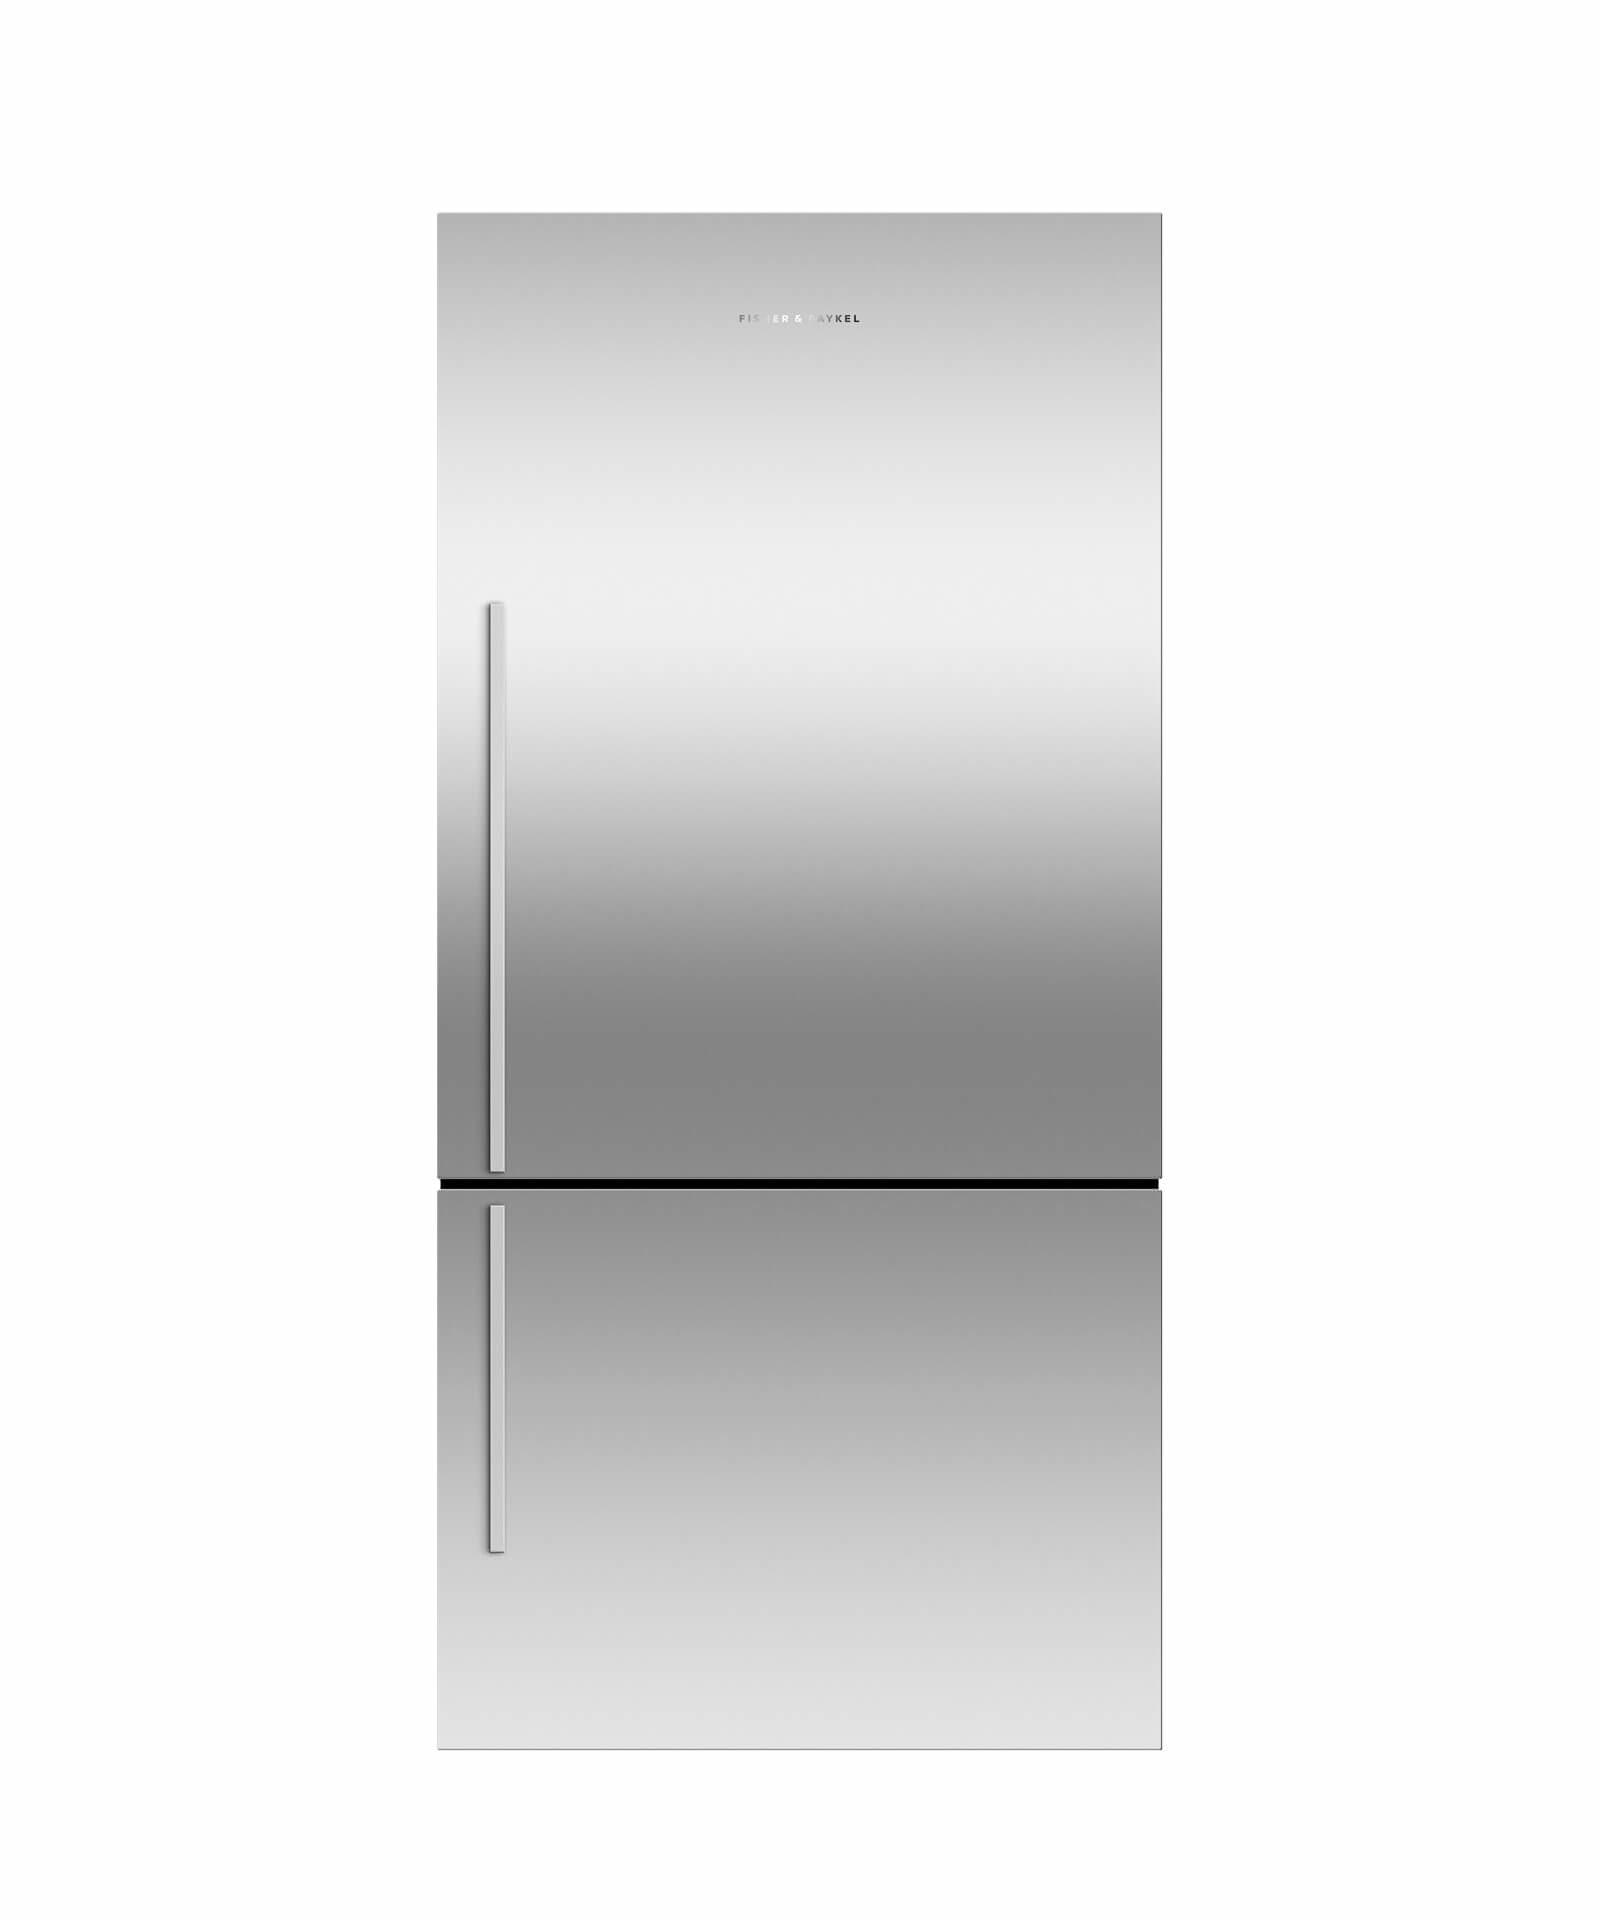 Fisher & Paykel Fridge Freezer 790mm, 519L, Ice E522BRXFDJ5